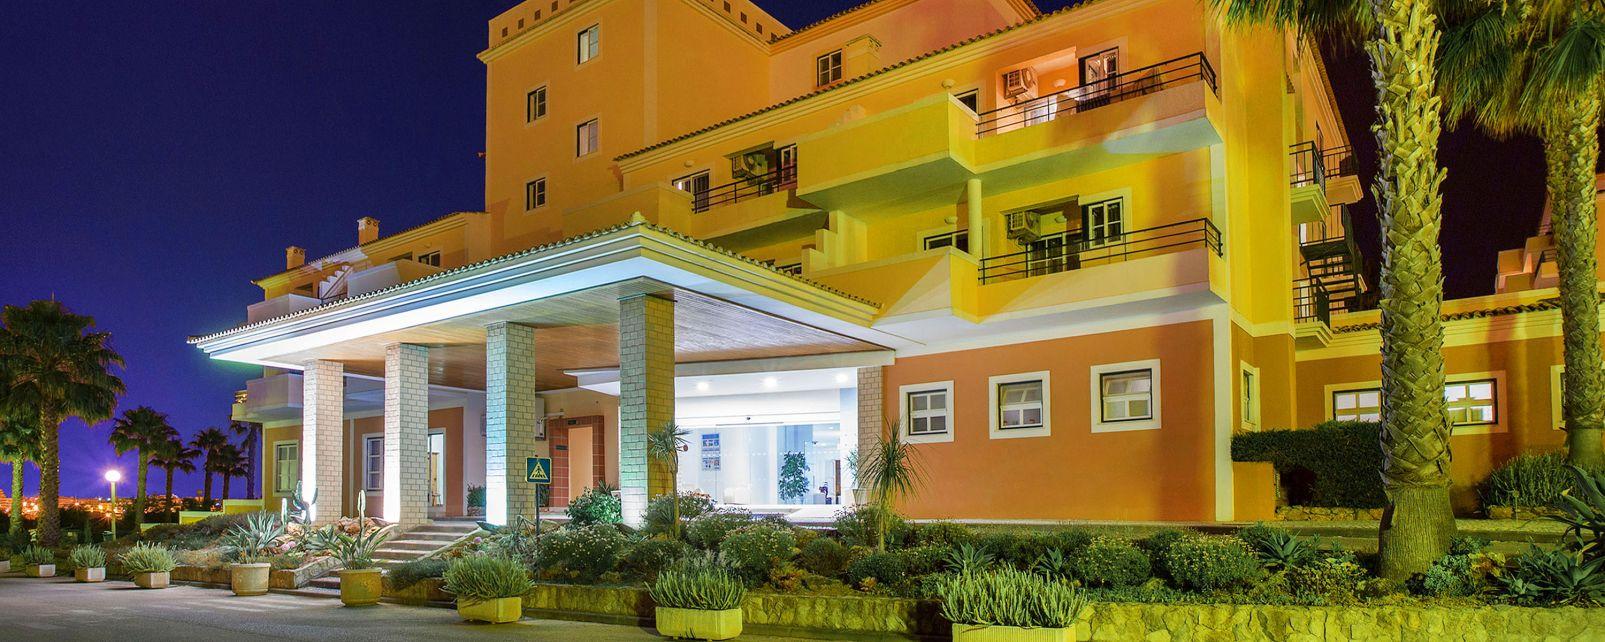 Hôtel Vitor's Plaza Aparthotel